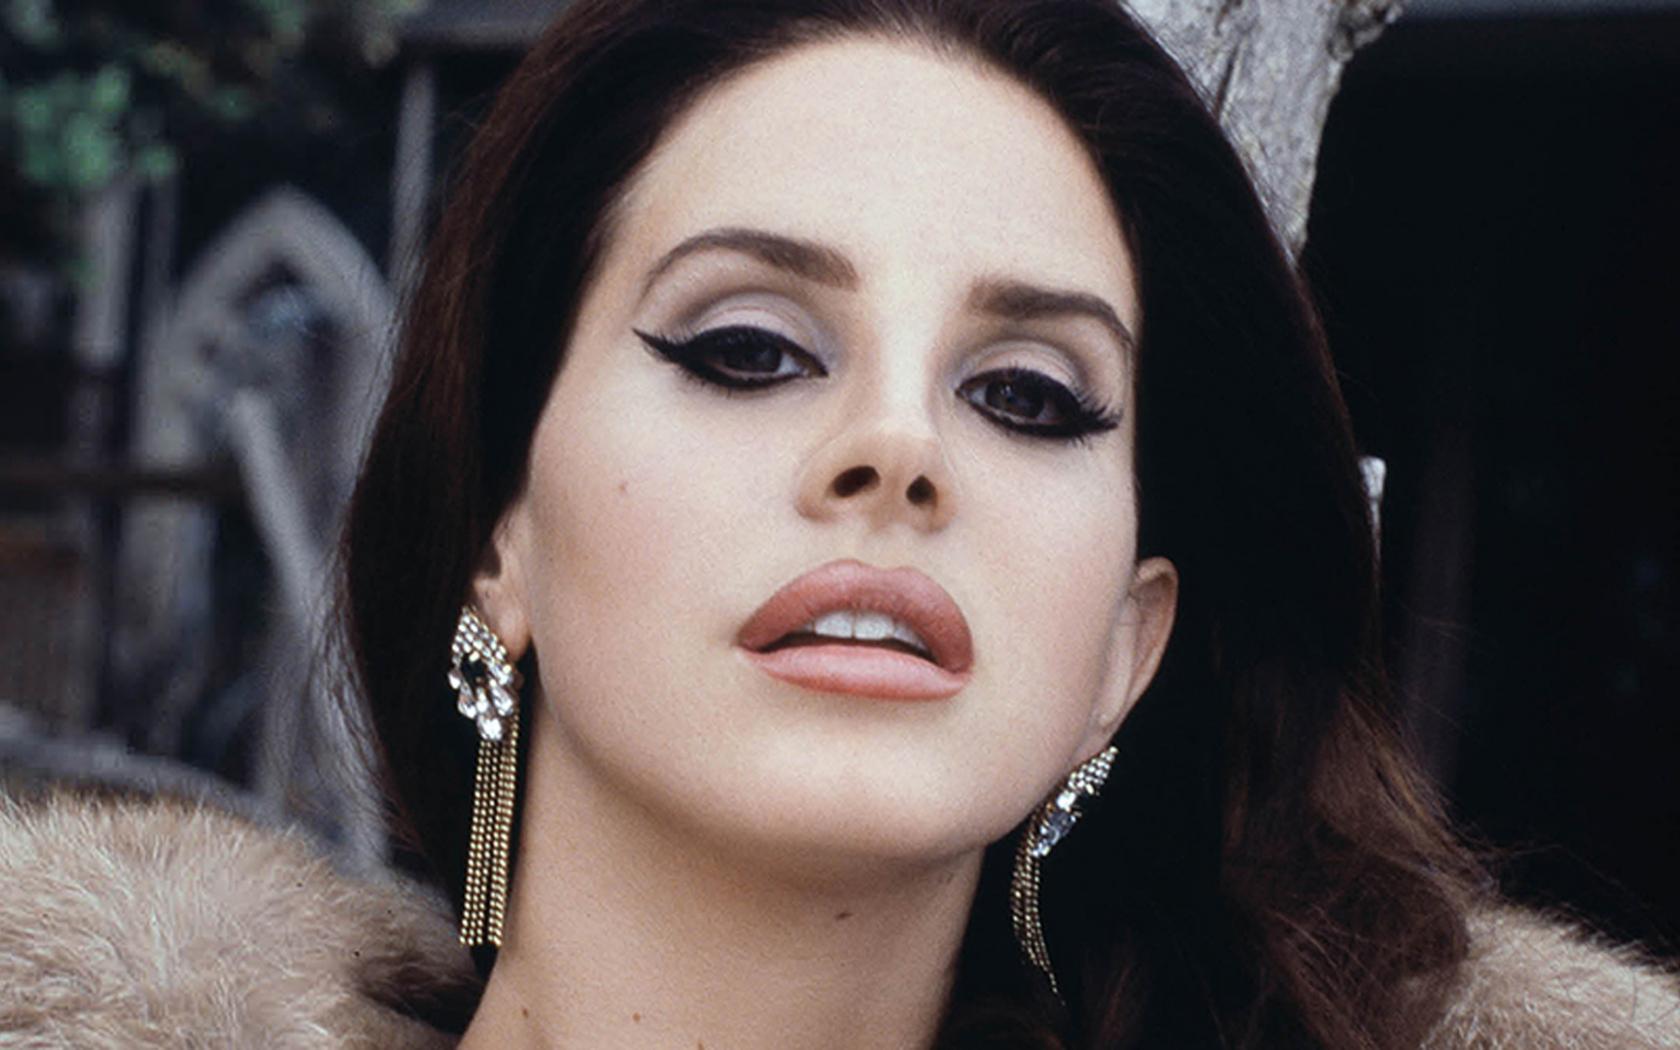 Free Download Hd Lana Del Rey Wallpapers Hdcoolwallpaperscom